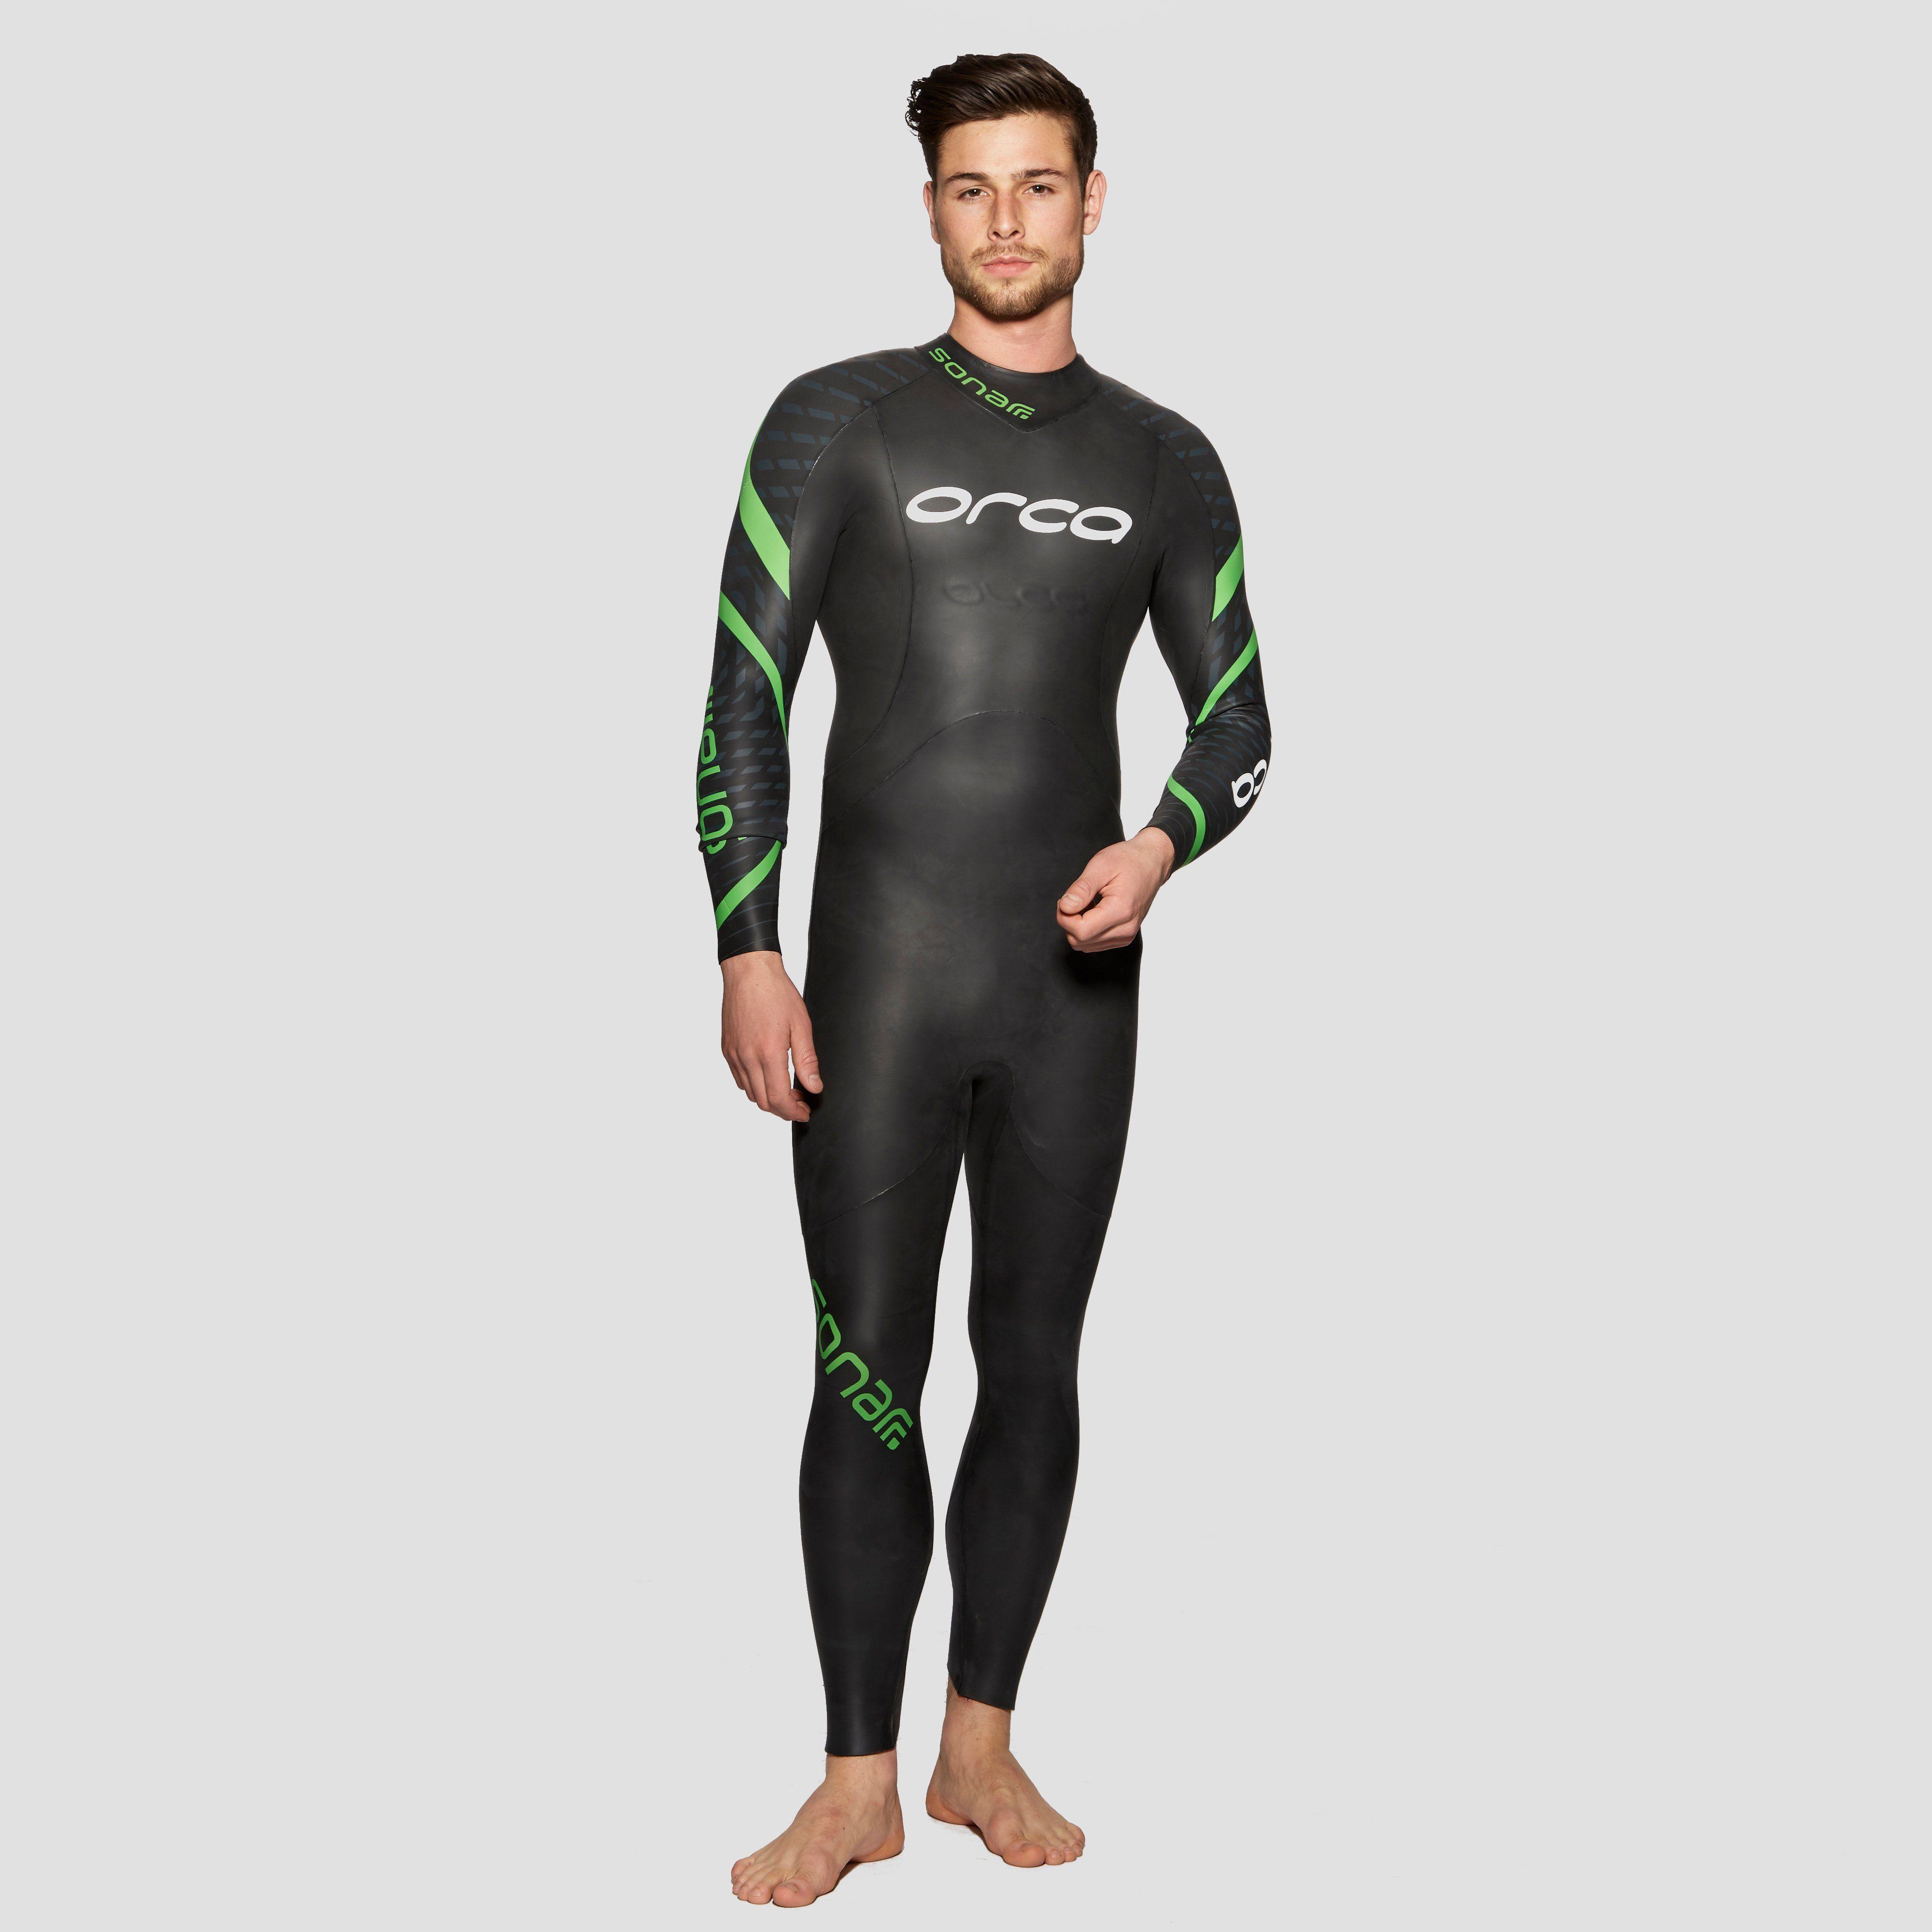 Orca Sonar Men's Wetsuit